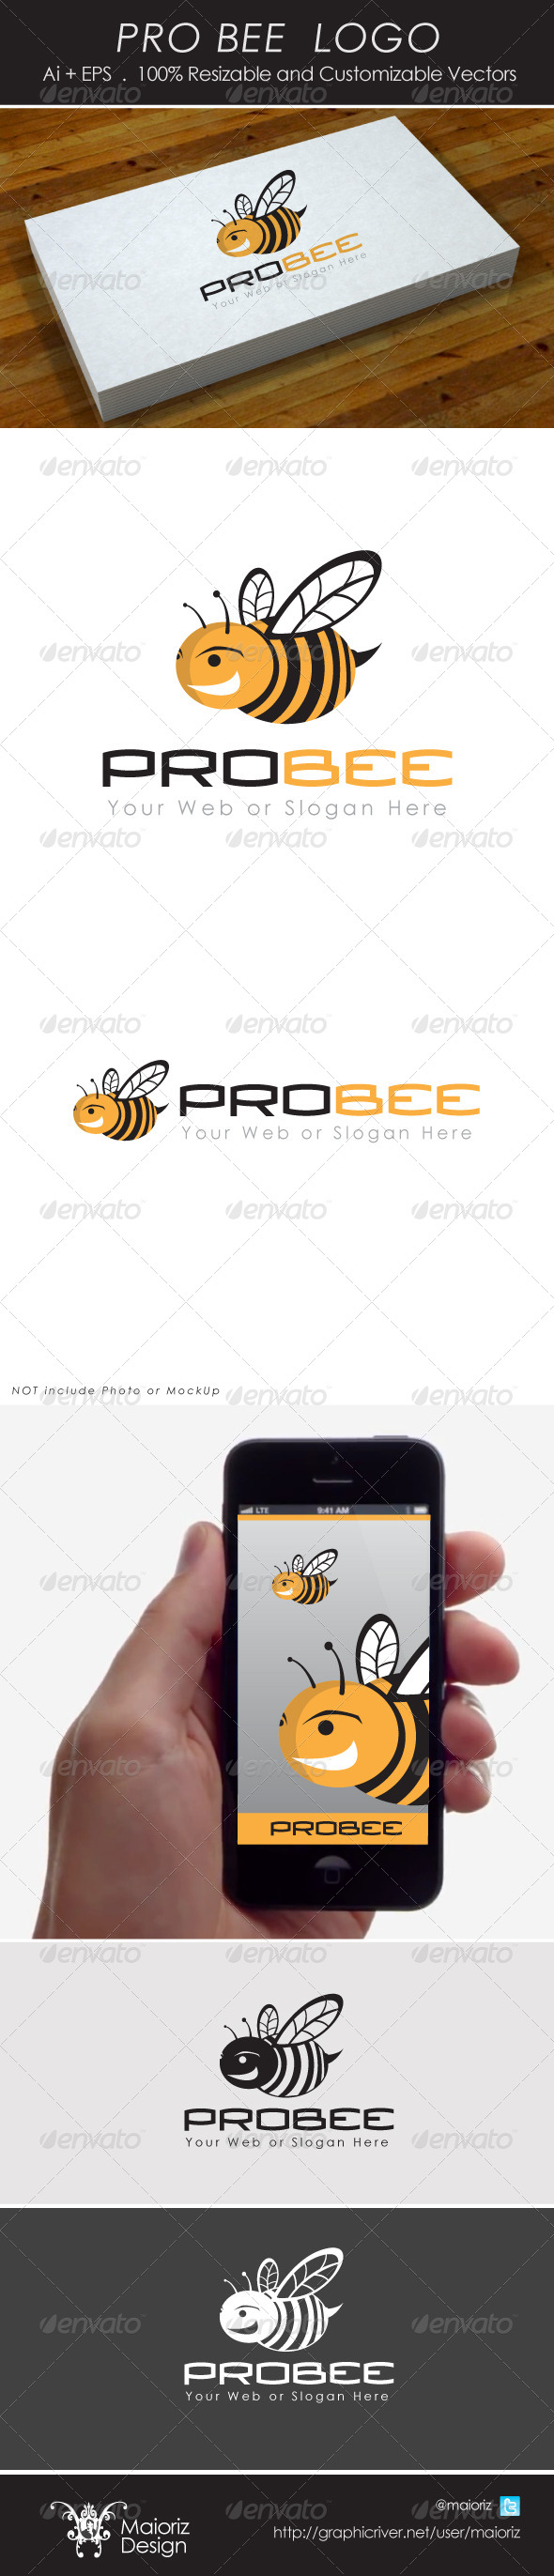 GraphicRiver Pro Bee Logo 4279018